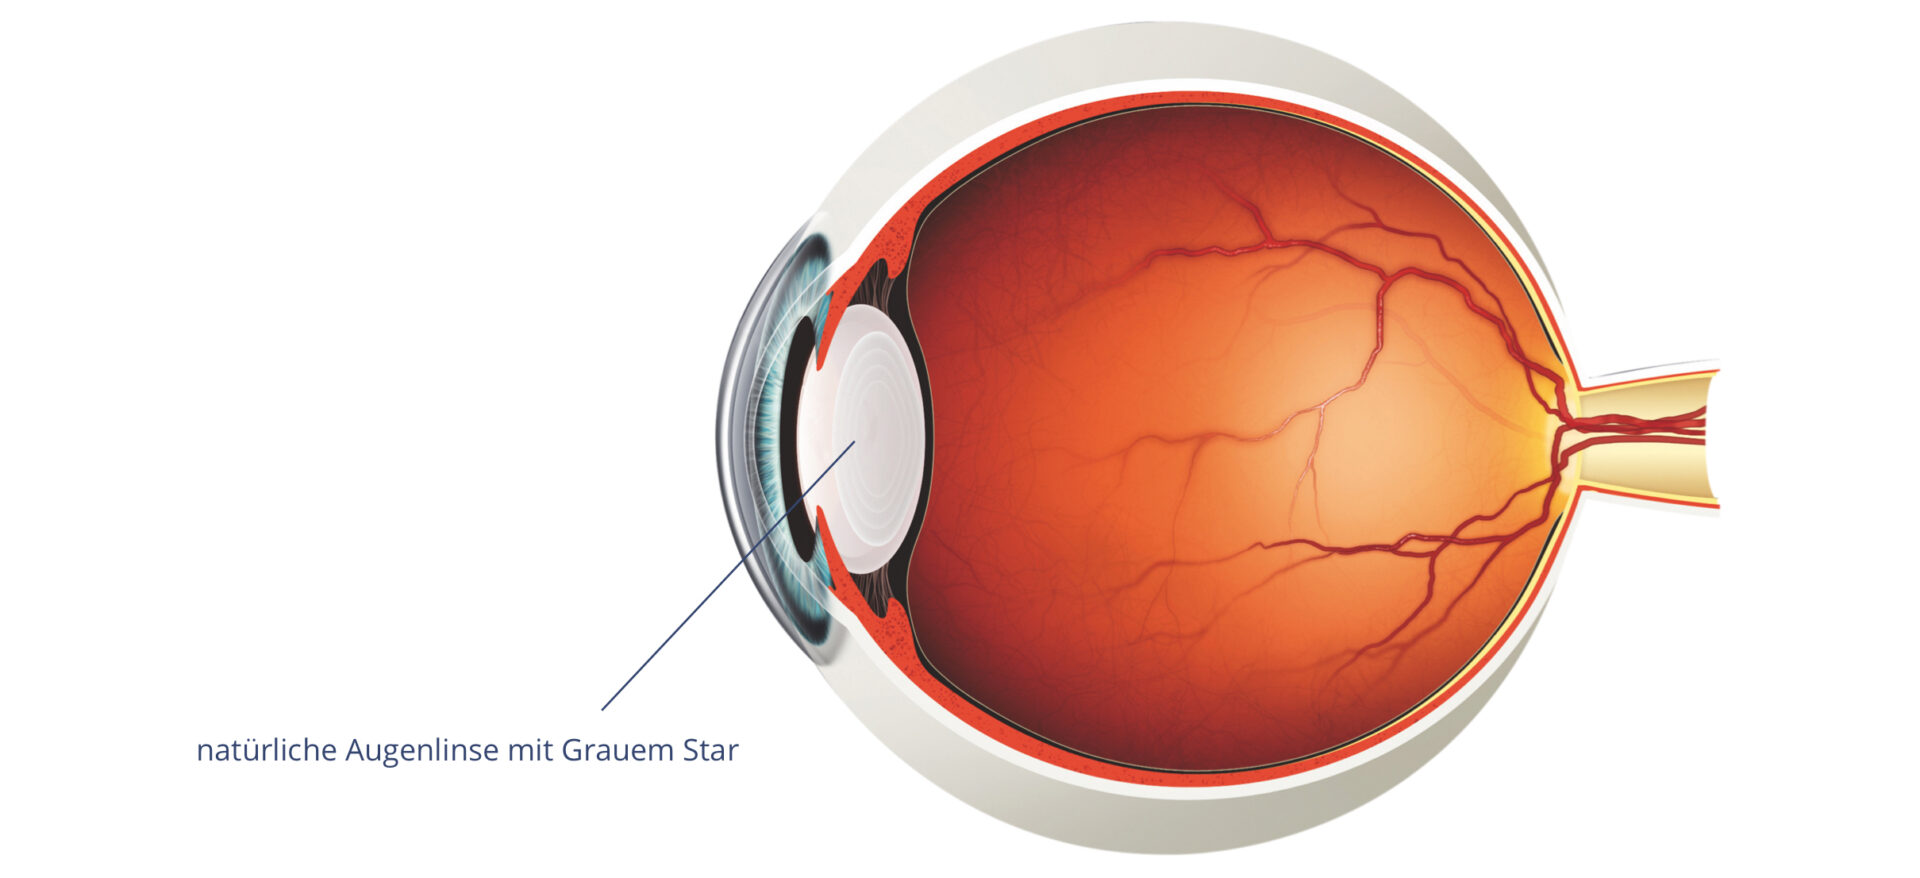 Abbildung Auge - Grauer Star